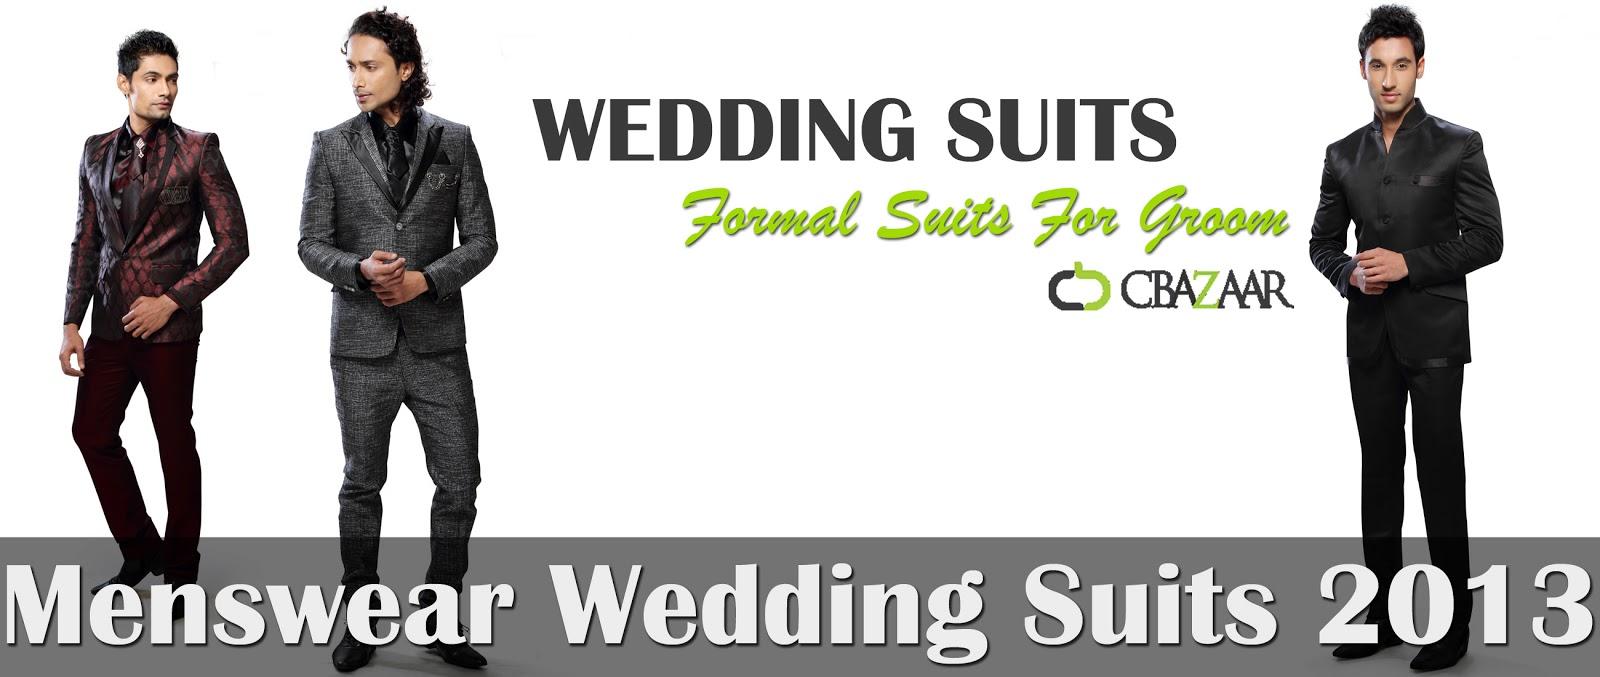 Menswear Wedding Suits 2013 2014